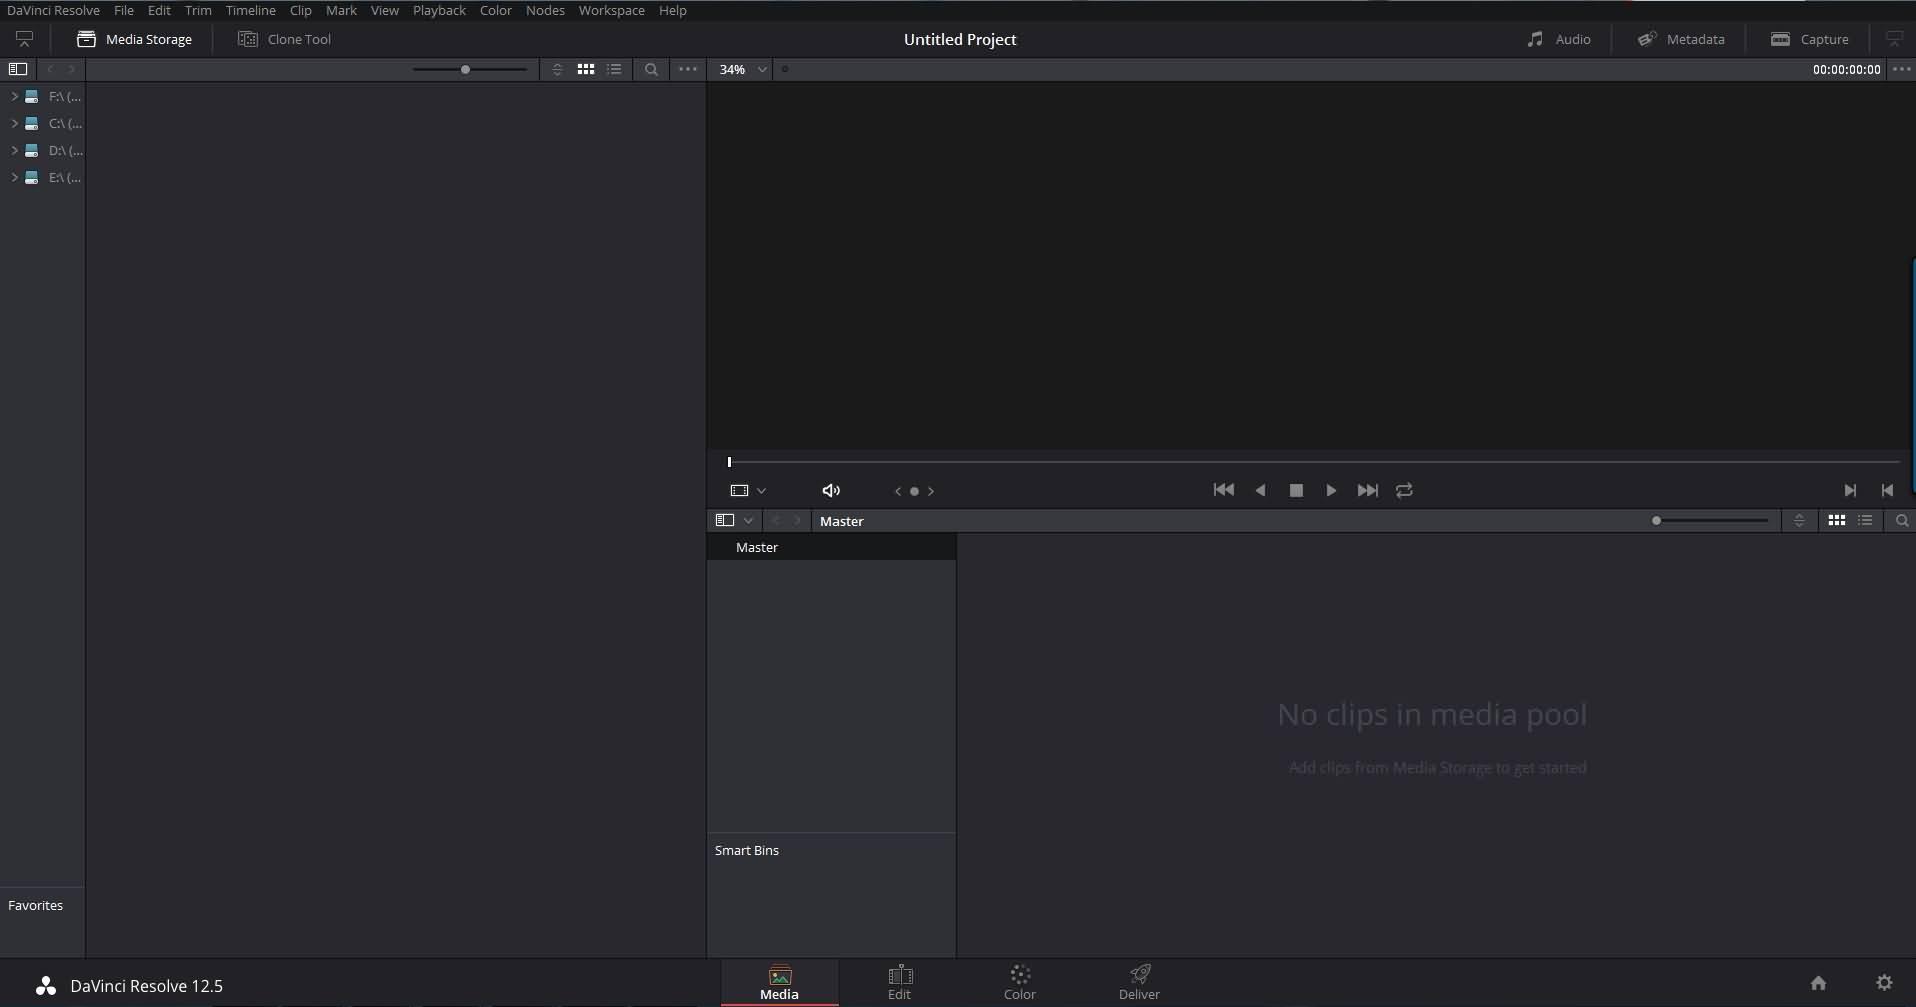 editor friendly interface